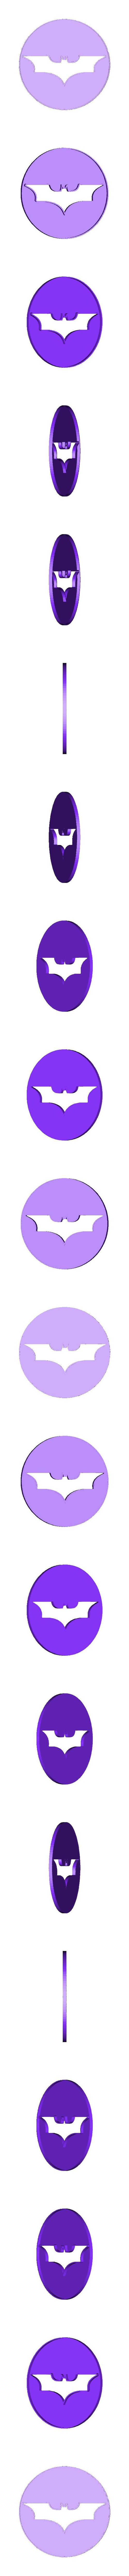 BATMAN BLANCO.stl Download STL file ILLUMINATED SIGN BATMAN BATSIGNAL • 3D printer model, librexviii